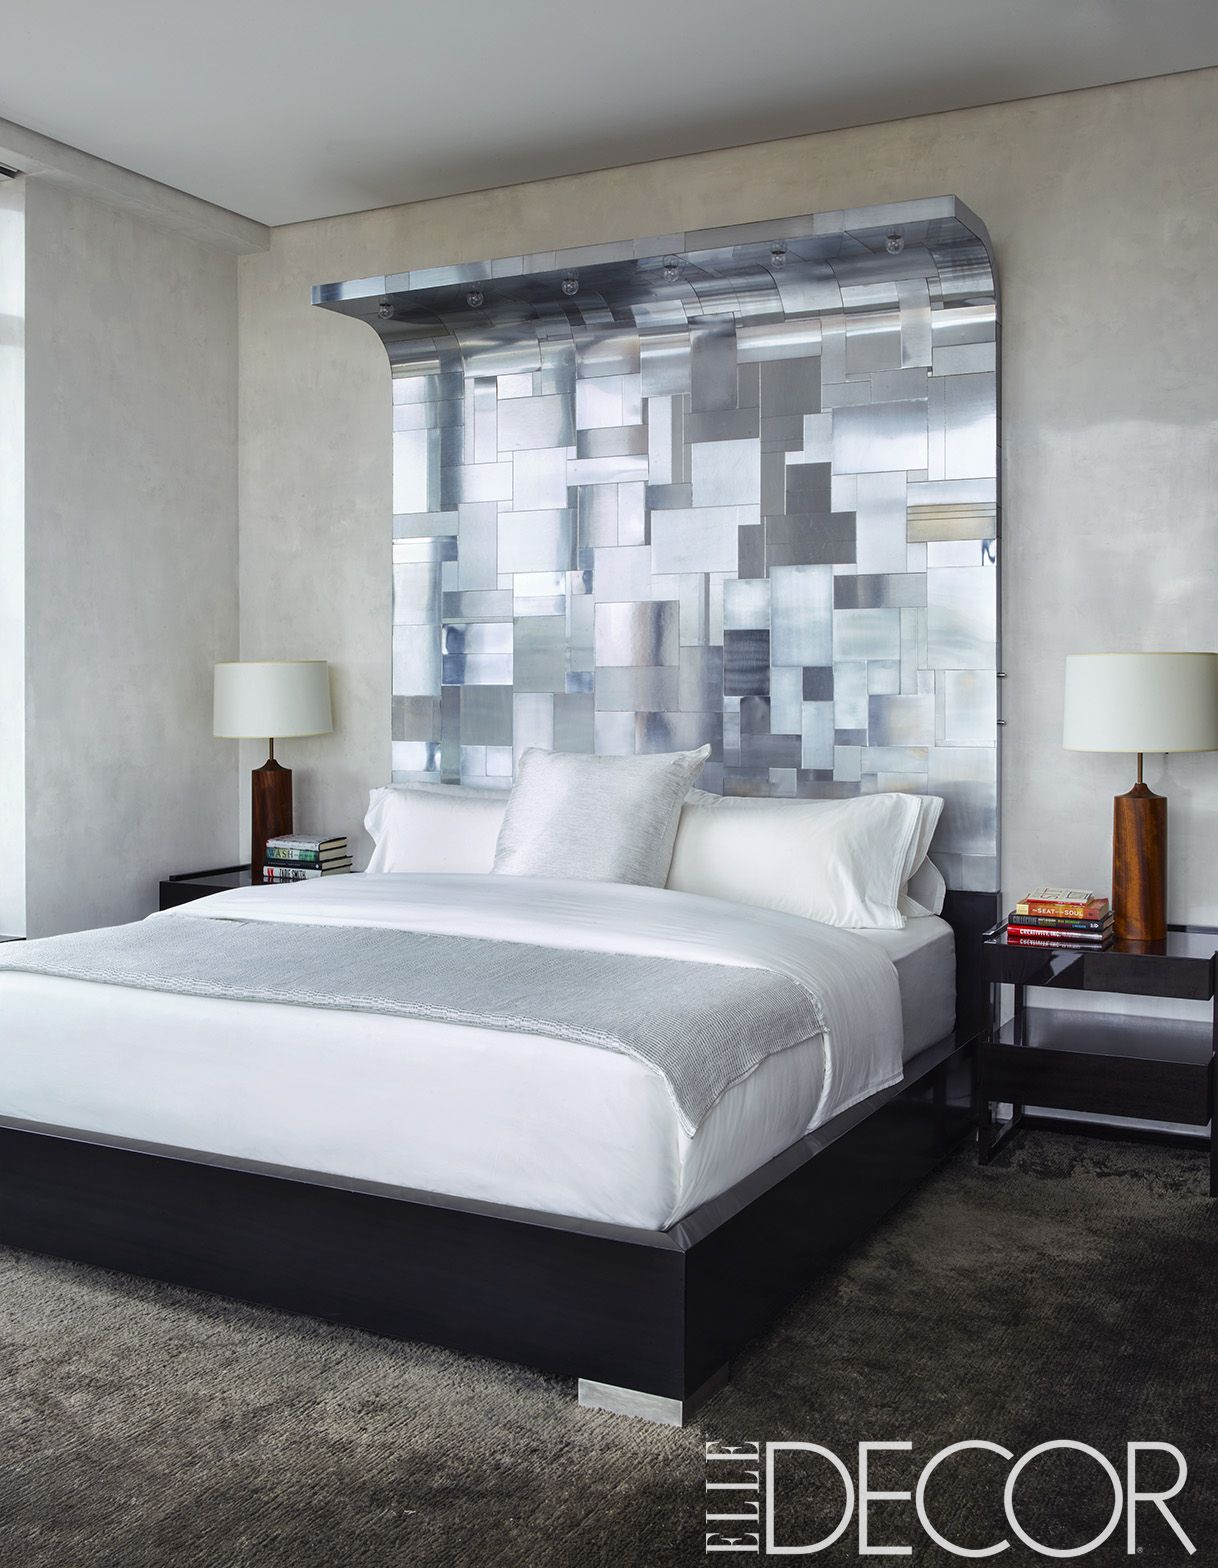 25 Minimalist Bedroom Decor Ideas - Modern Designs for ... on Bedroom Minimalist Ideas  id=16593